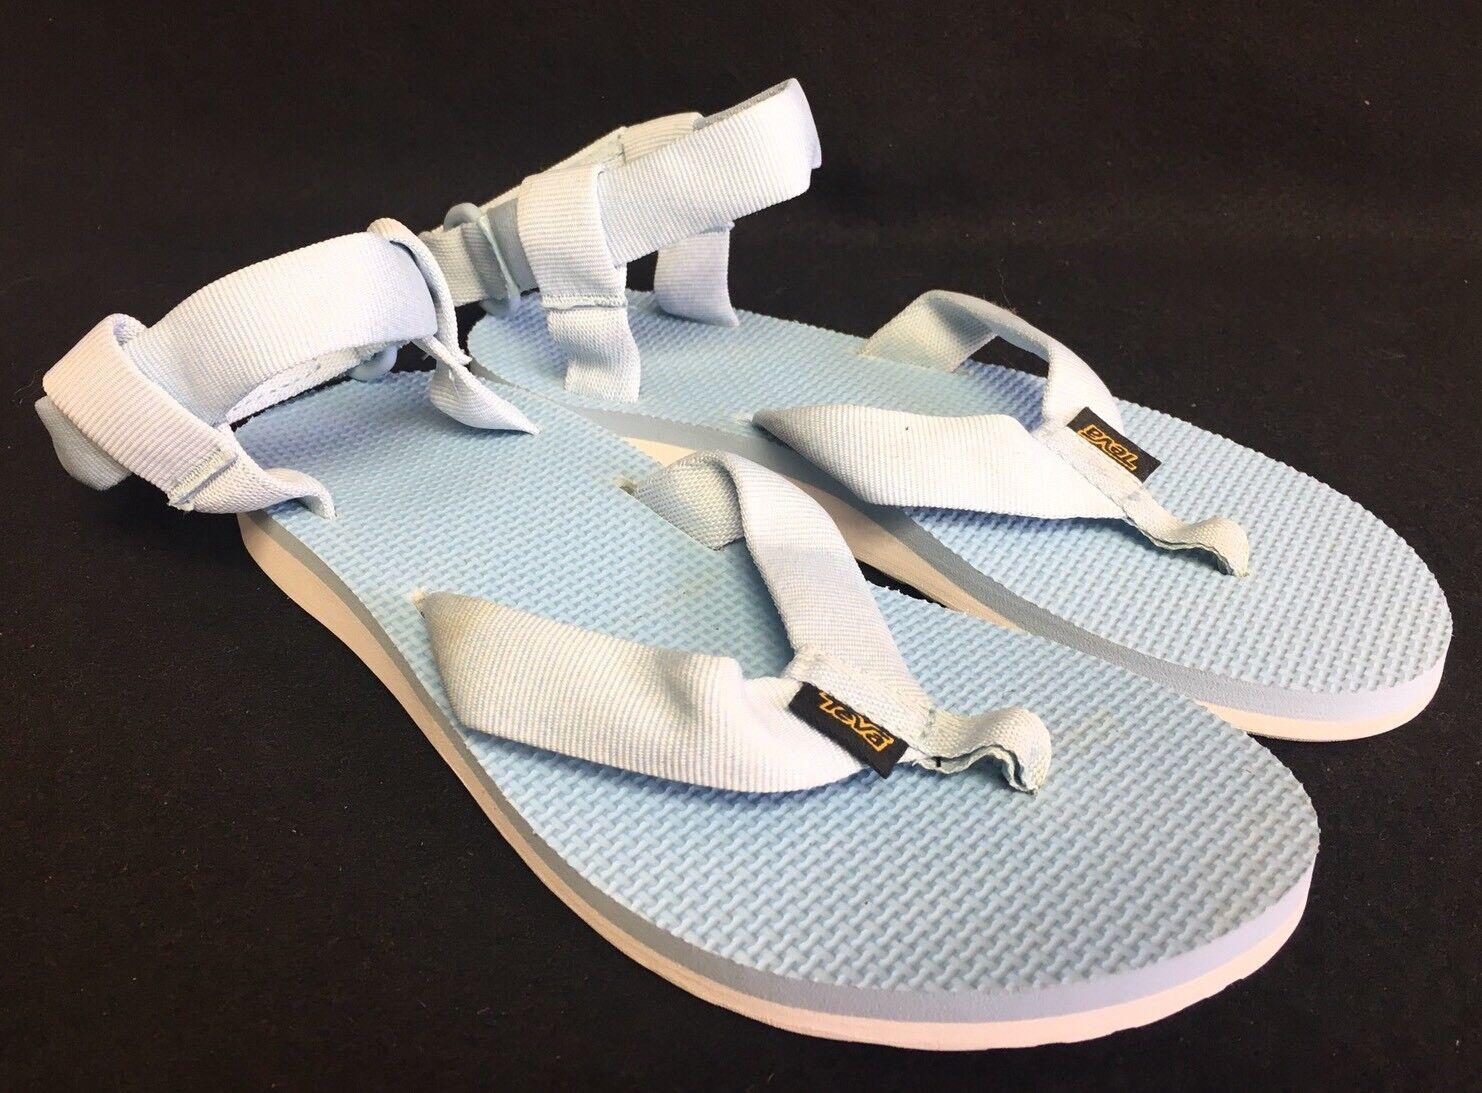 TEVA Flops ORIGINAL Womens SPORT SANDALS Thongs Flip Flops TEVA Strappy 1003986 Marled Blue e1ef14